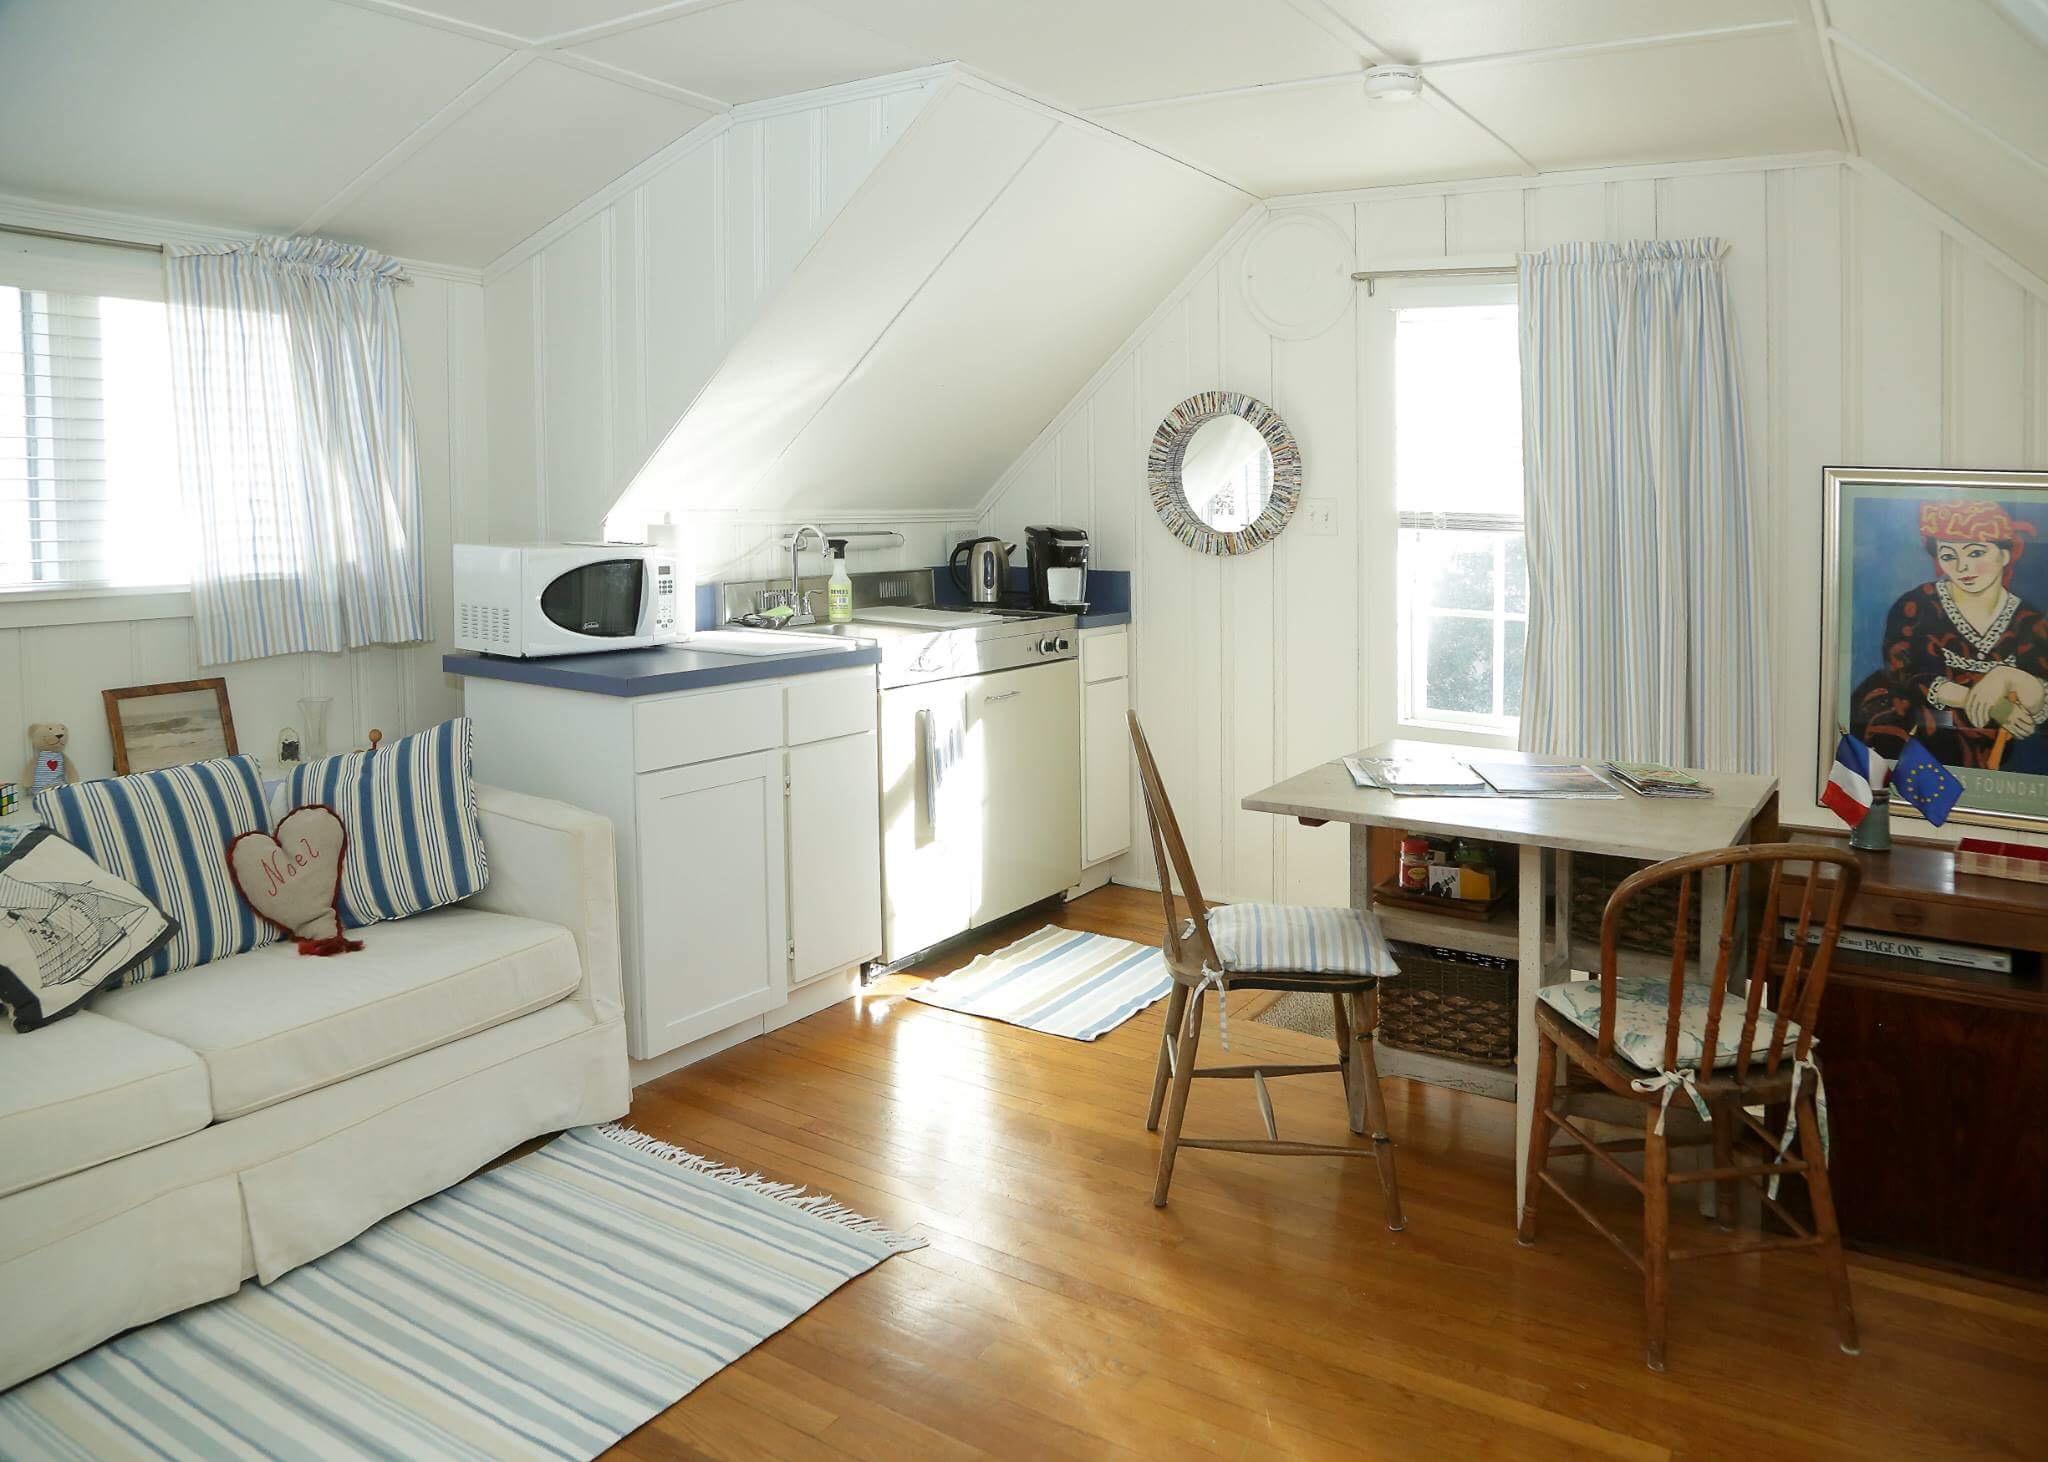 Charming Studio Apt Above Garage Apartments For Rent In Virginia Beach Virginia United States